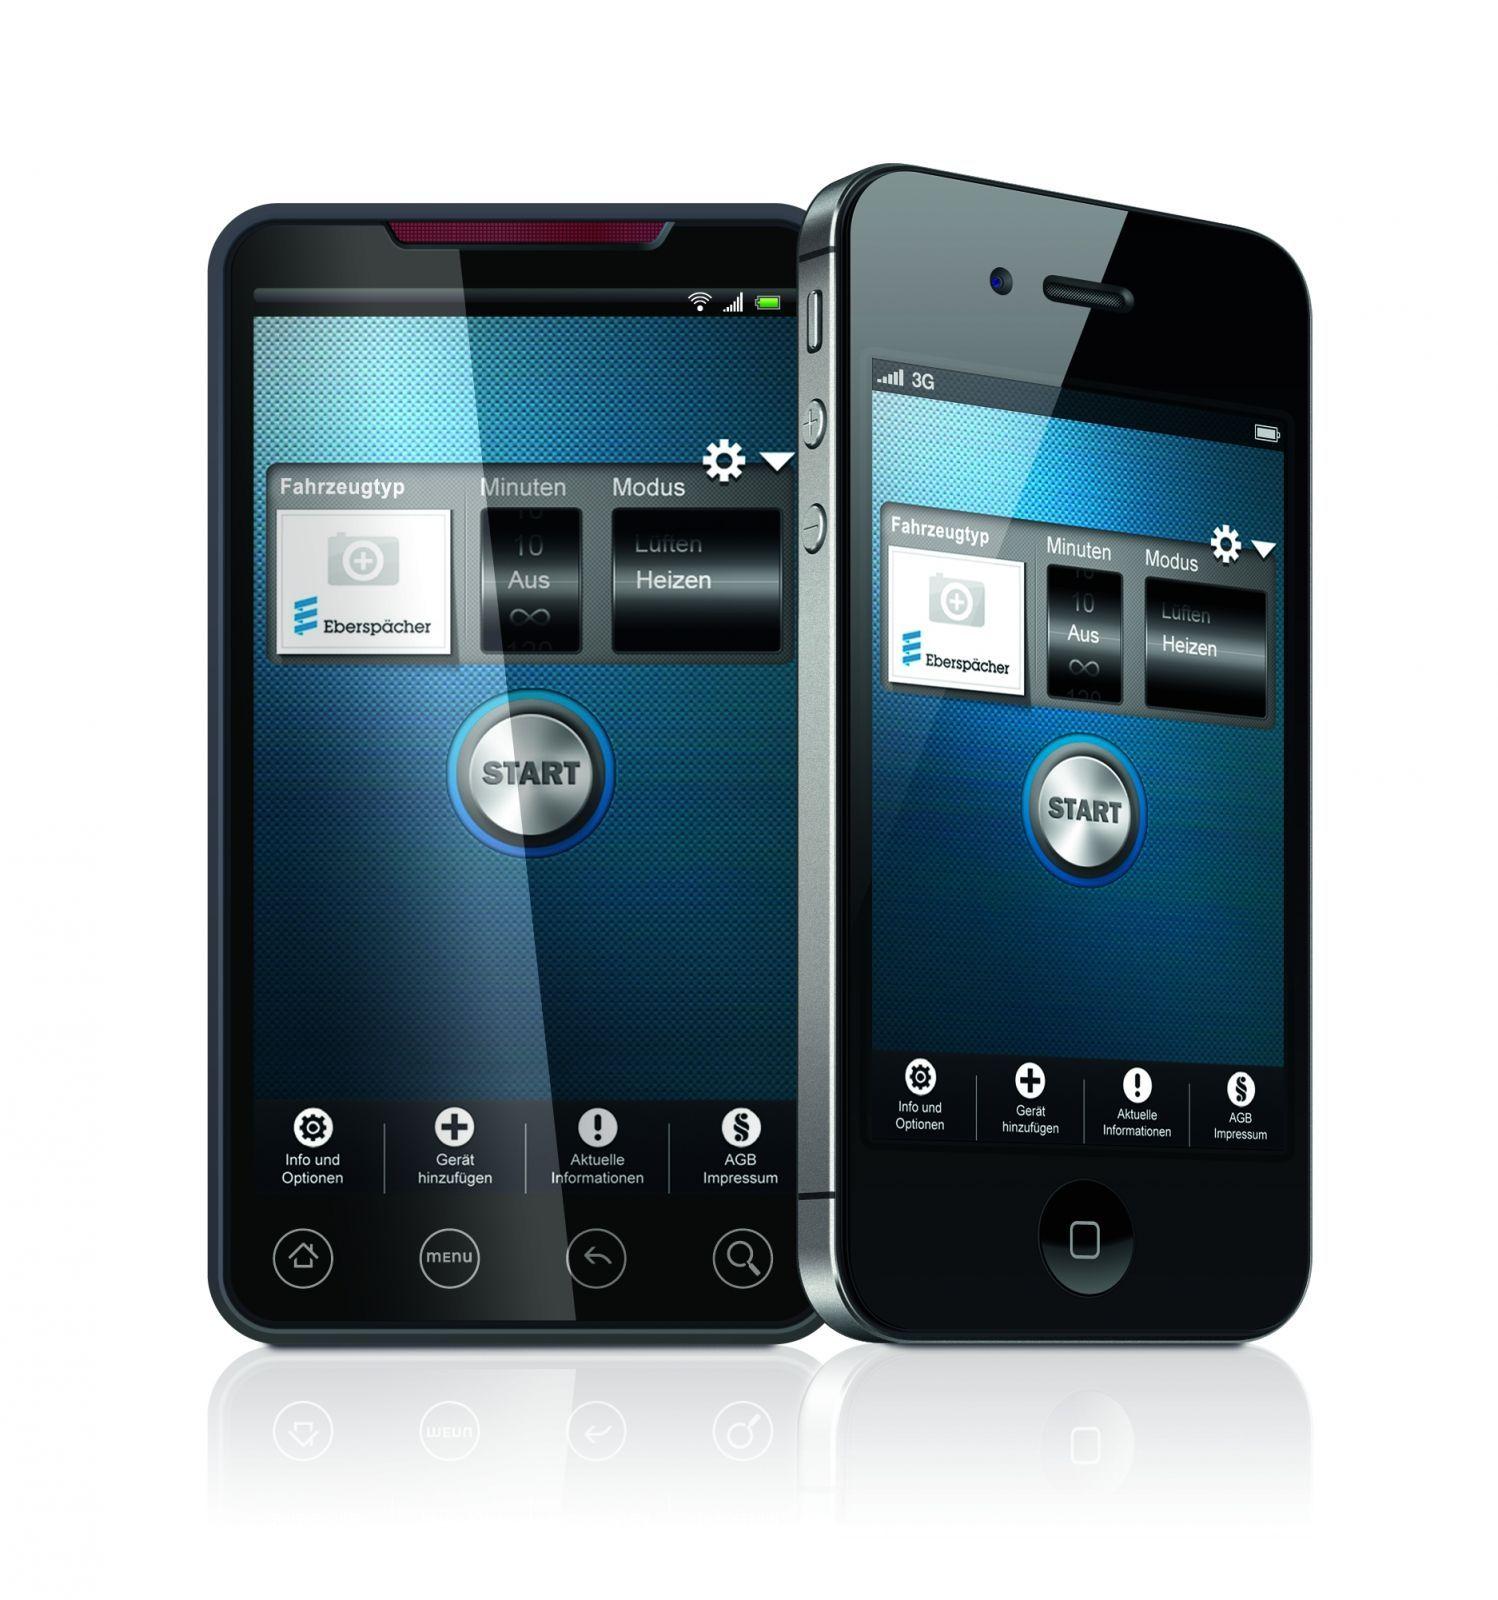 EasyStart call telephone remote control 221000340100 Eberspächer